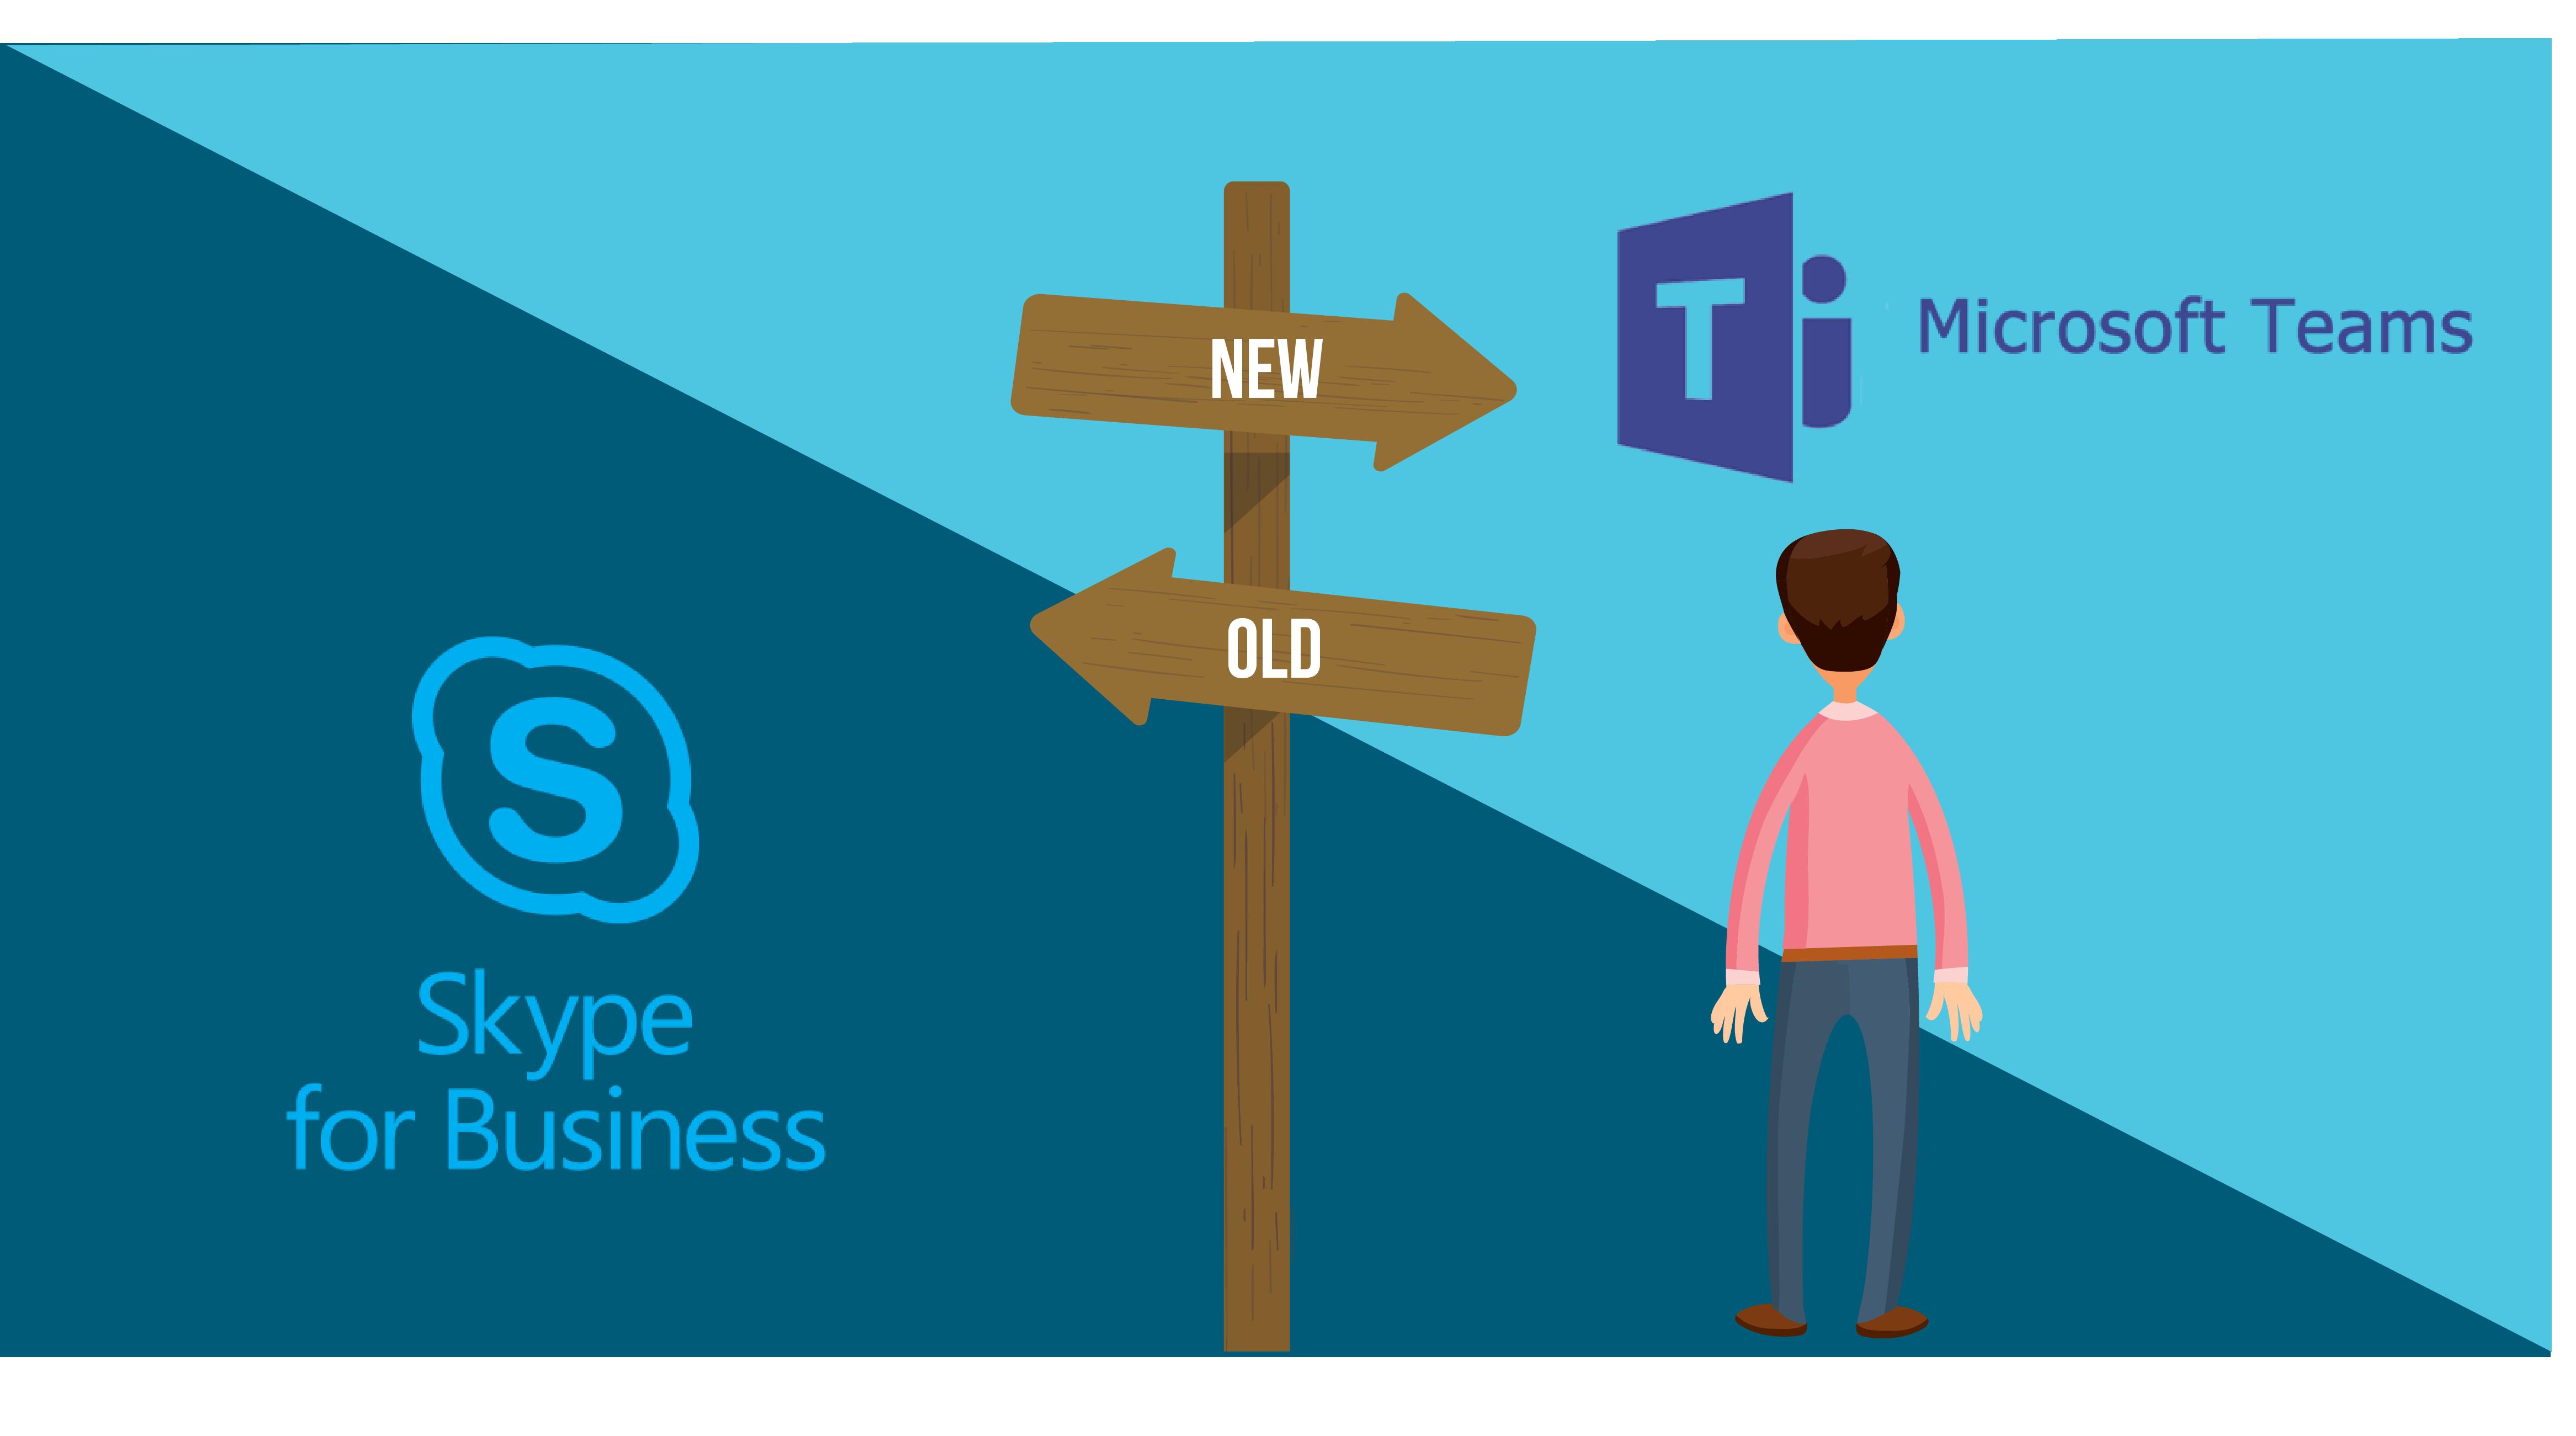 Webinar: Be productive with Microsoft Teams by Piet Vermeir